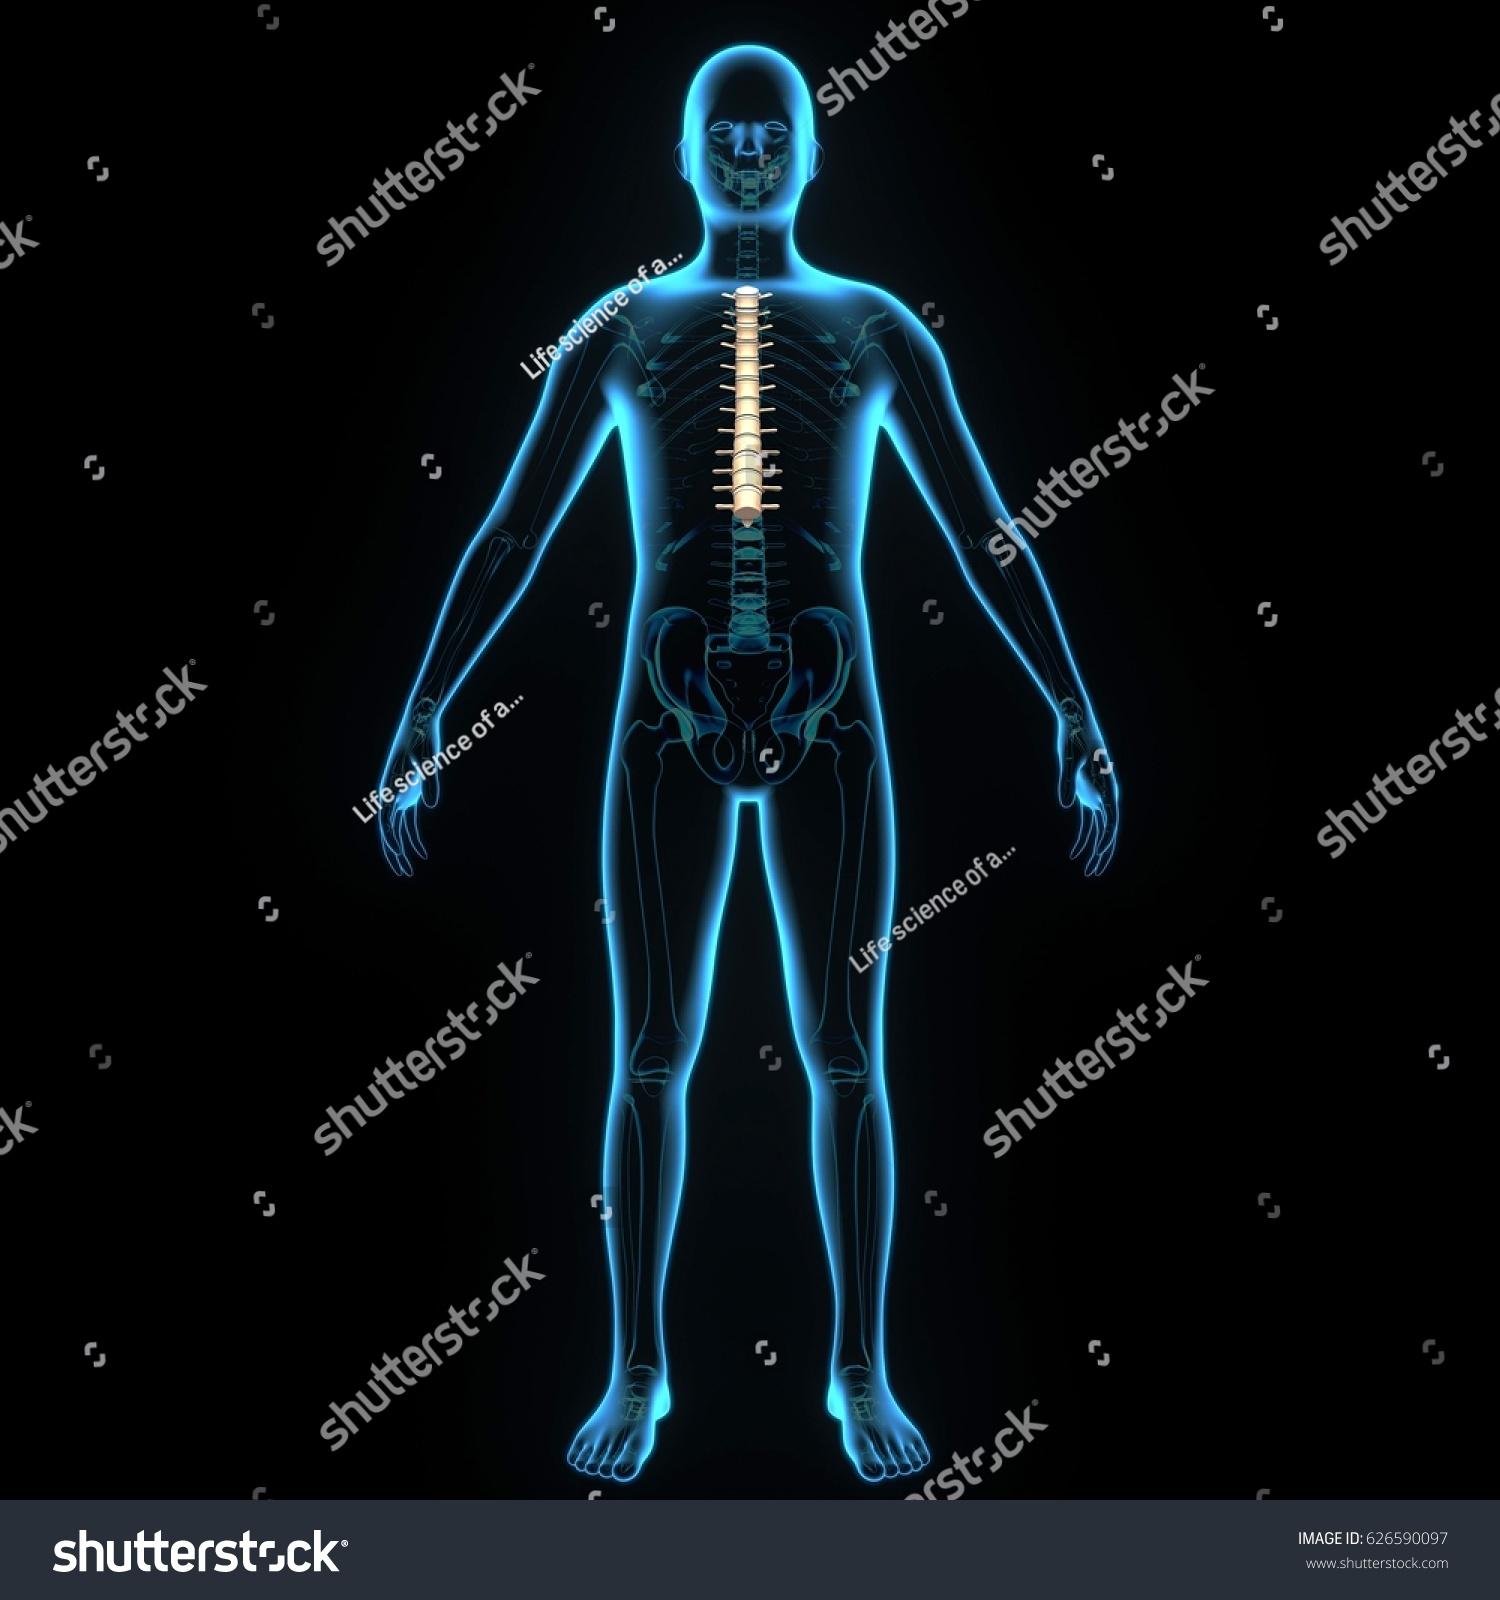 3 D Illustrator Thoracic Pain Backbone Anatomy Stock Illustration